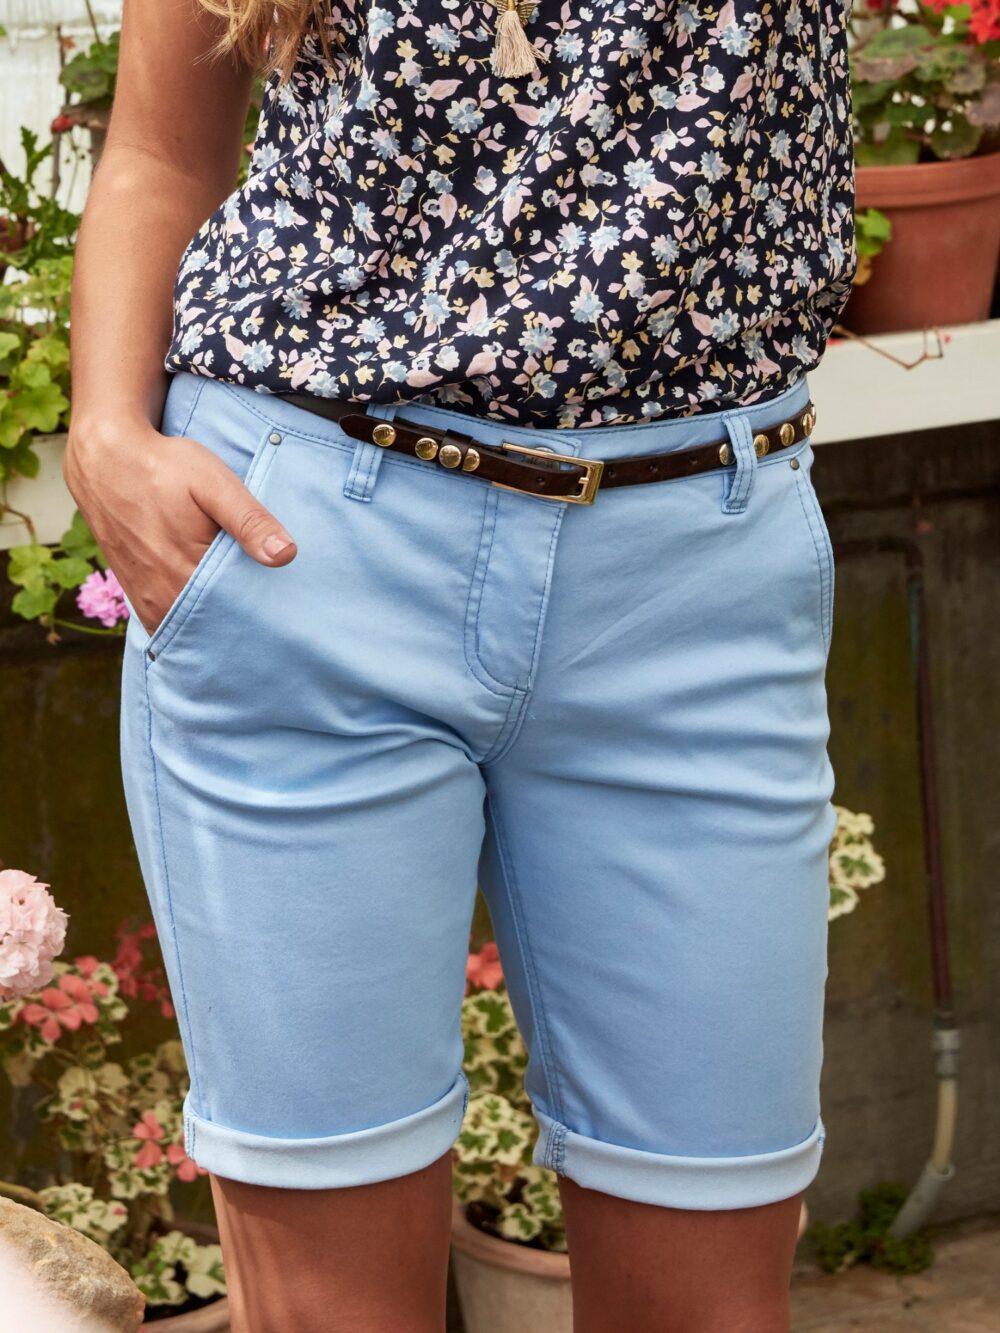 ZE-ZE Nordic Sanne 347 Shorts Light Blue